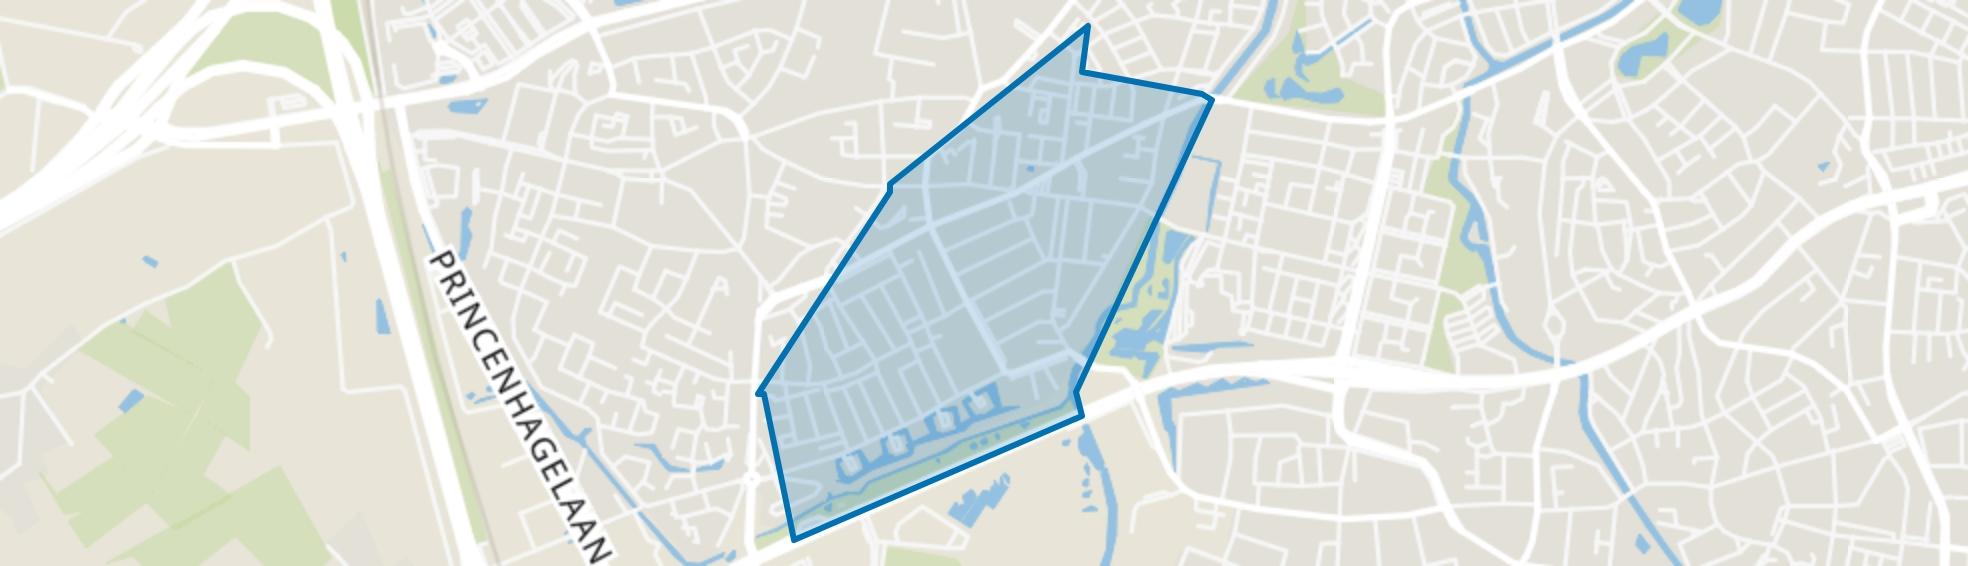 Heuvel, Breda map